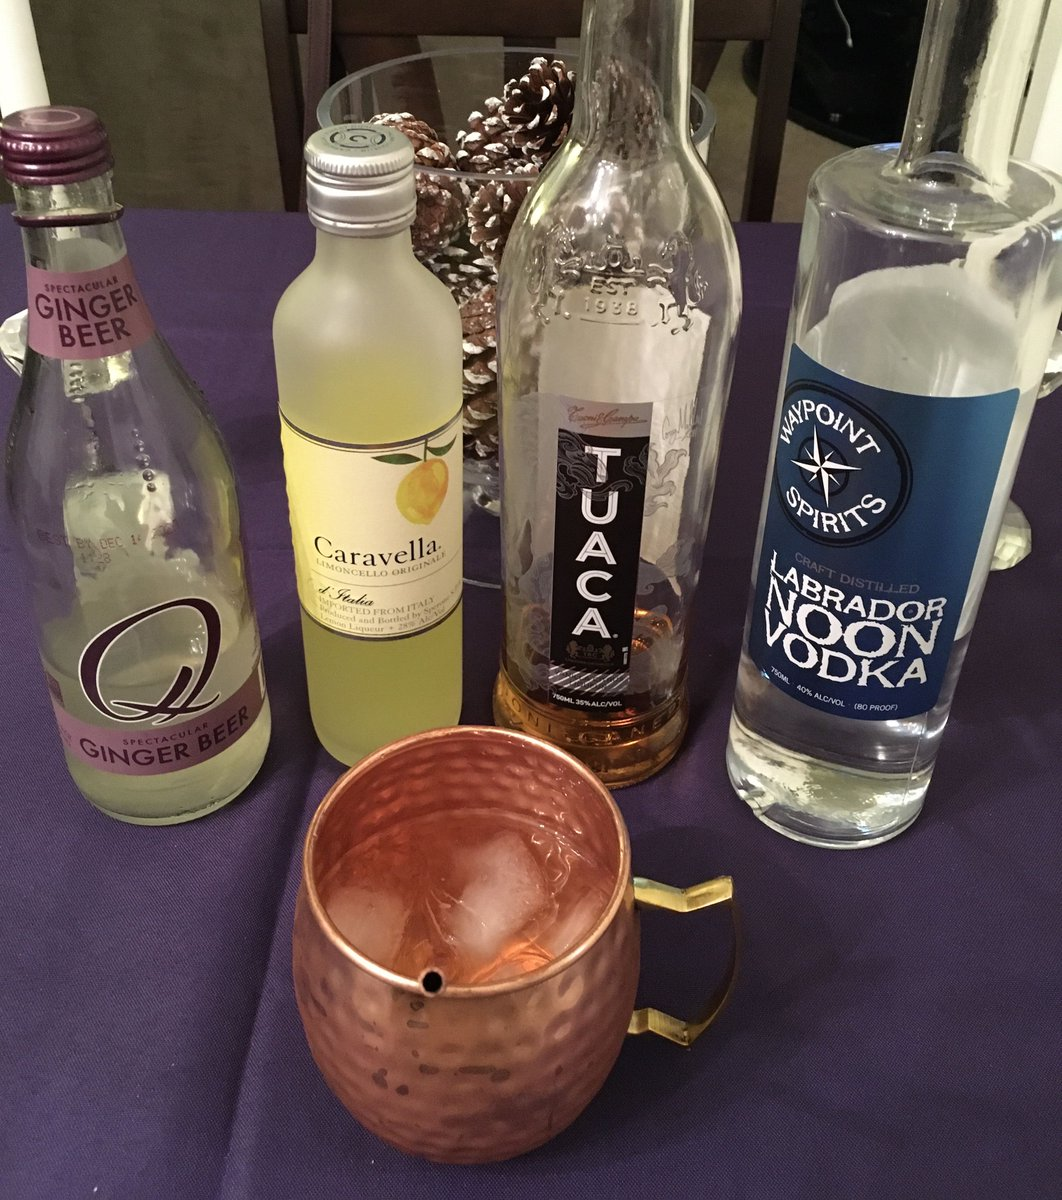 Explore an exciting world of tastes w/ #uniqueDarkDivacocktails like my Amalfi Mule — 2 oz. #waypointspirits @Drinkwaypoint #labradornoonvodka, 1 oz. #tuaca @TUACA #liqueur, 1oz. #caravellalimoncello & 4 oz. #qmixers @Qmixers #gingerbeer! Live like it matters! Saluti!🥃💋 https://t.co/1aJfNJK4cq